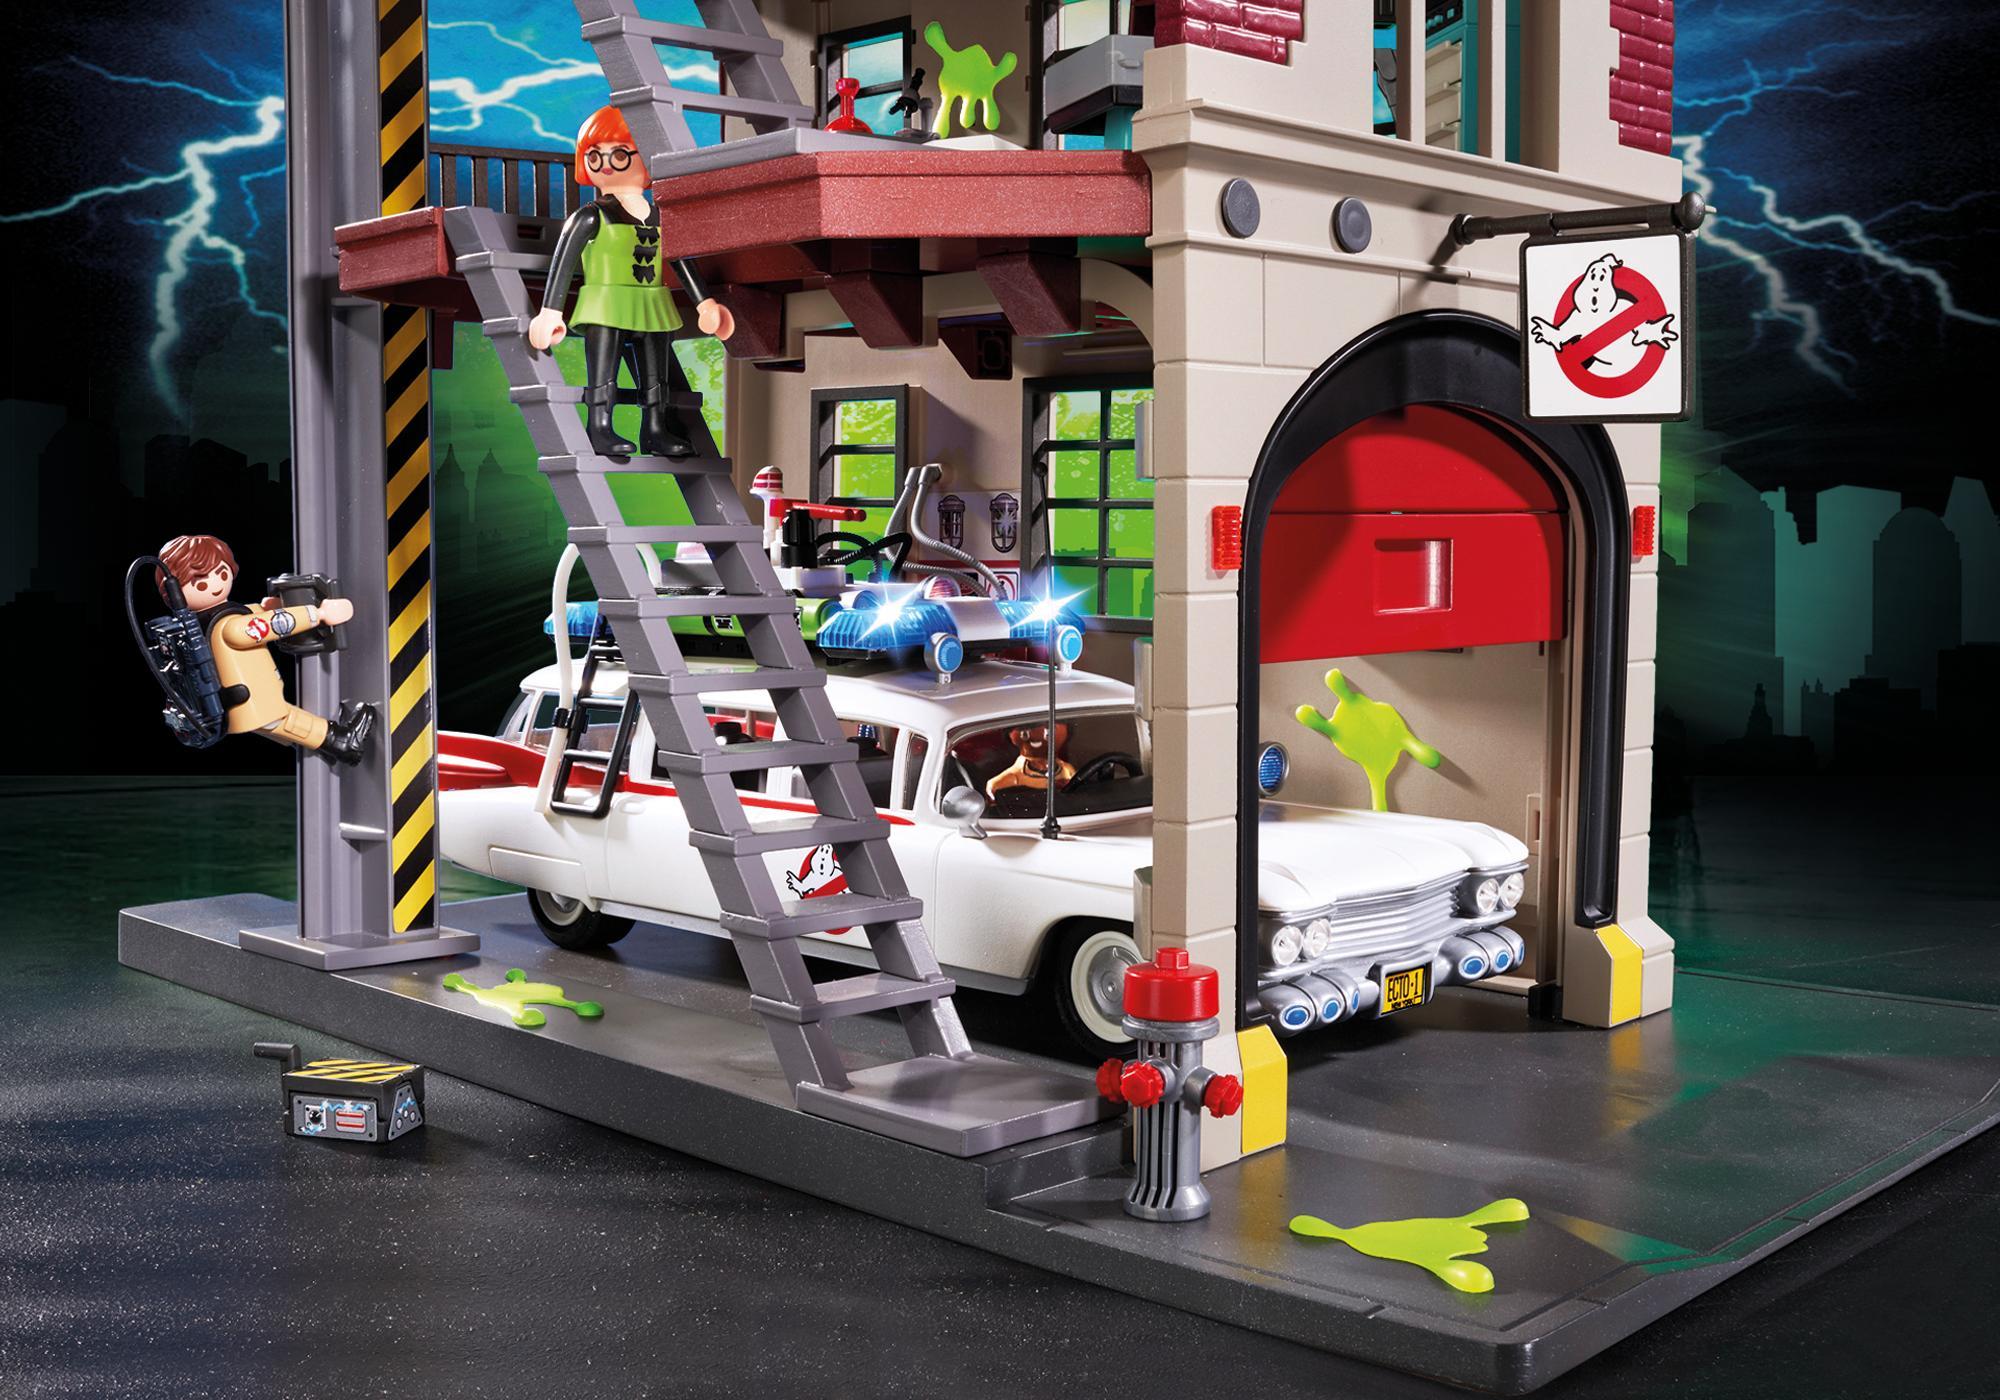 http://media.playmobil.com/i/playmobil/9220_product_extra1/Ecto-1 Ghostbusters™